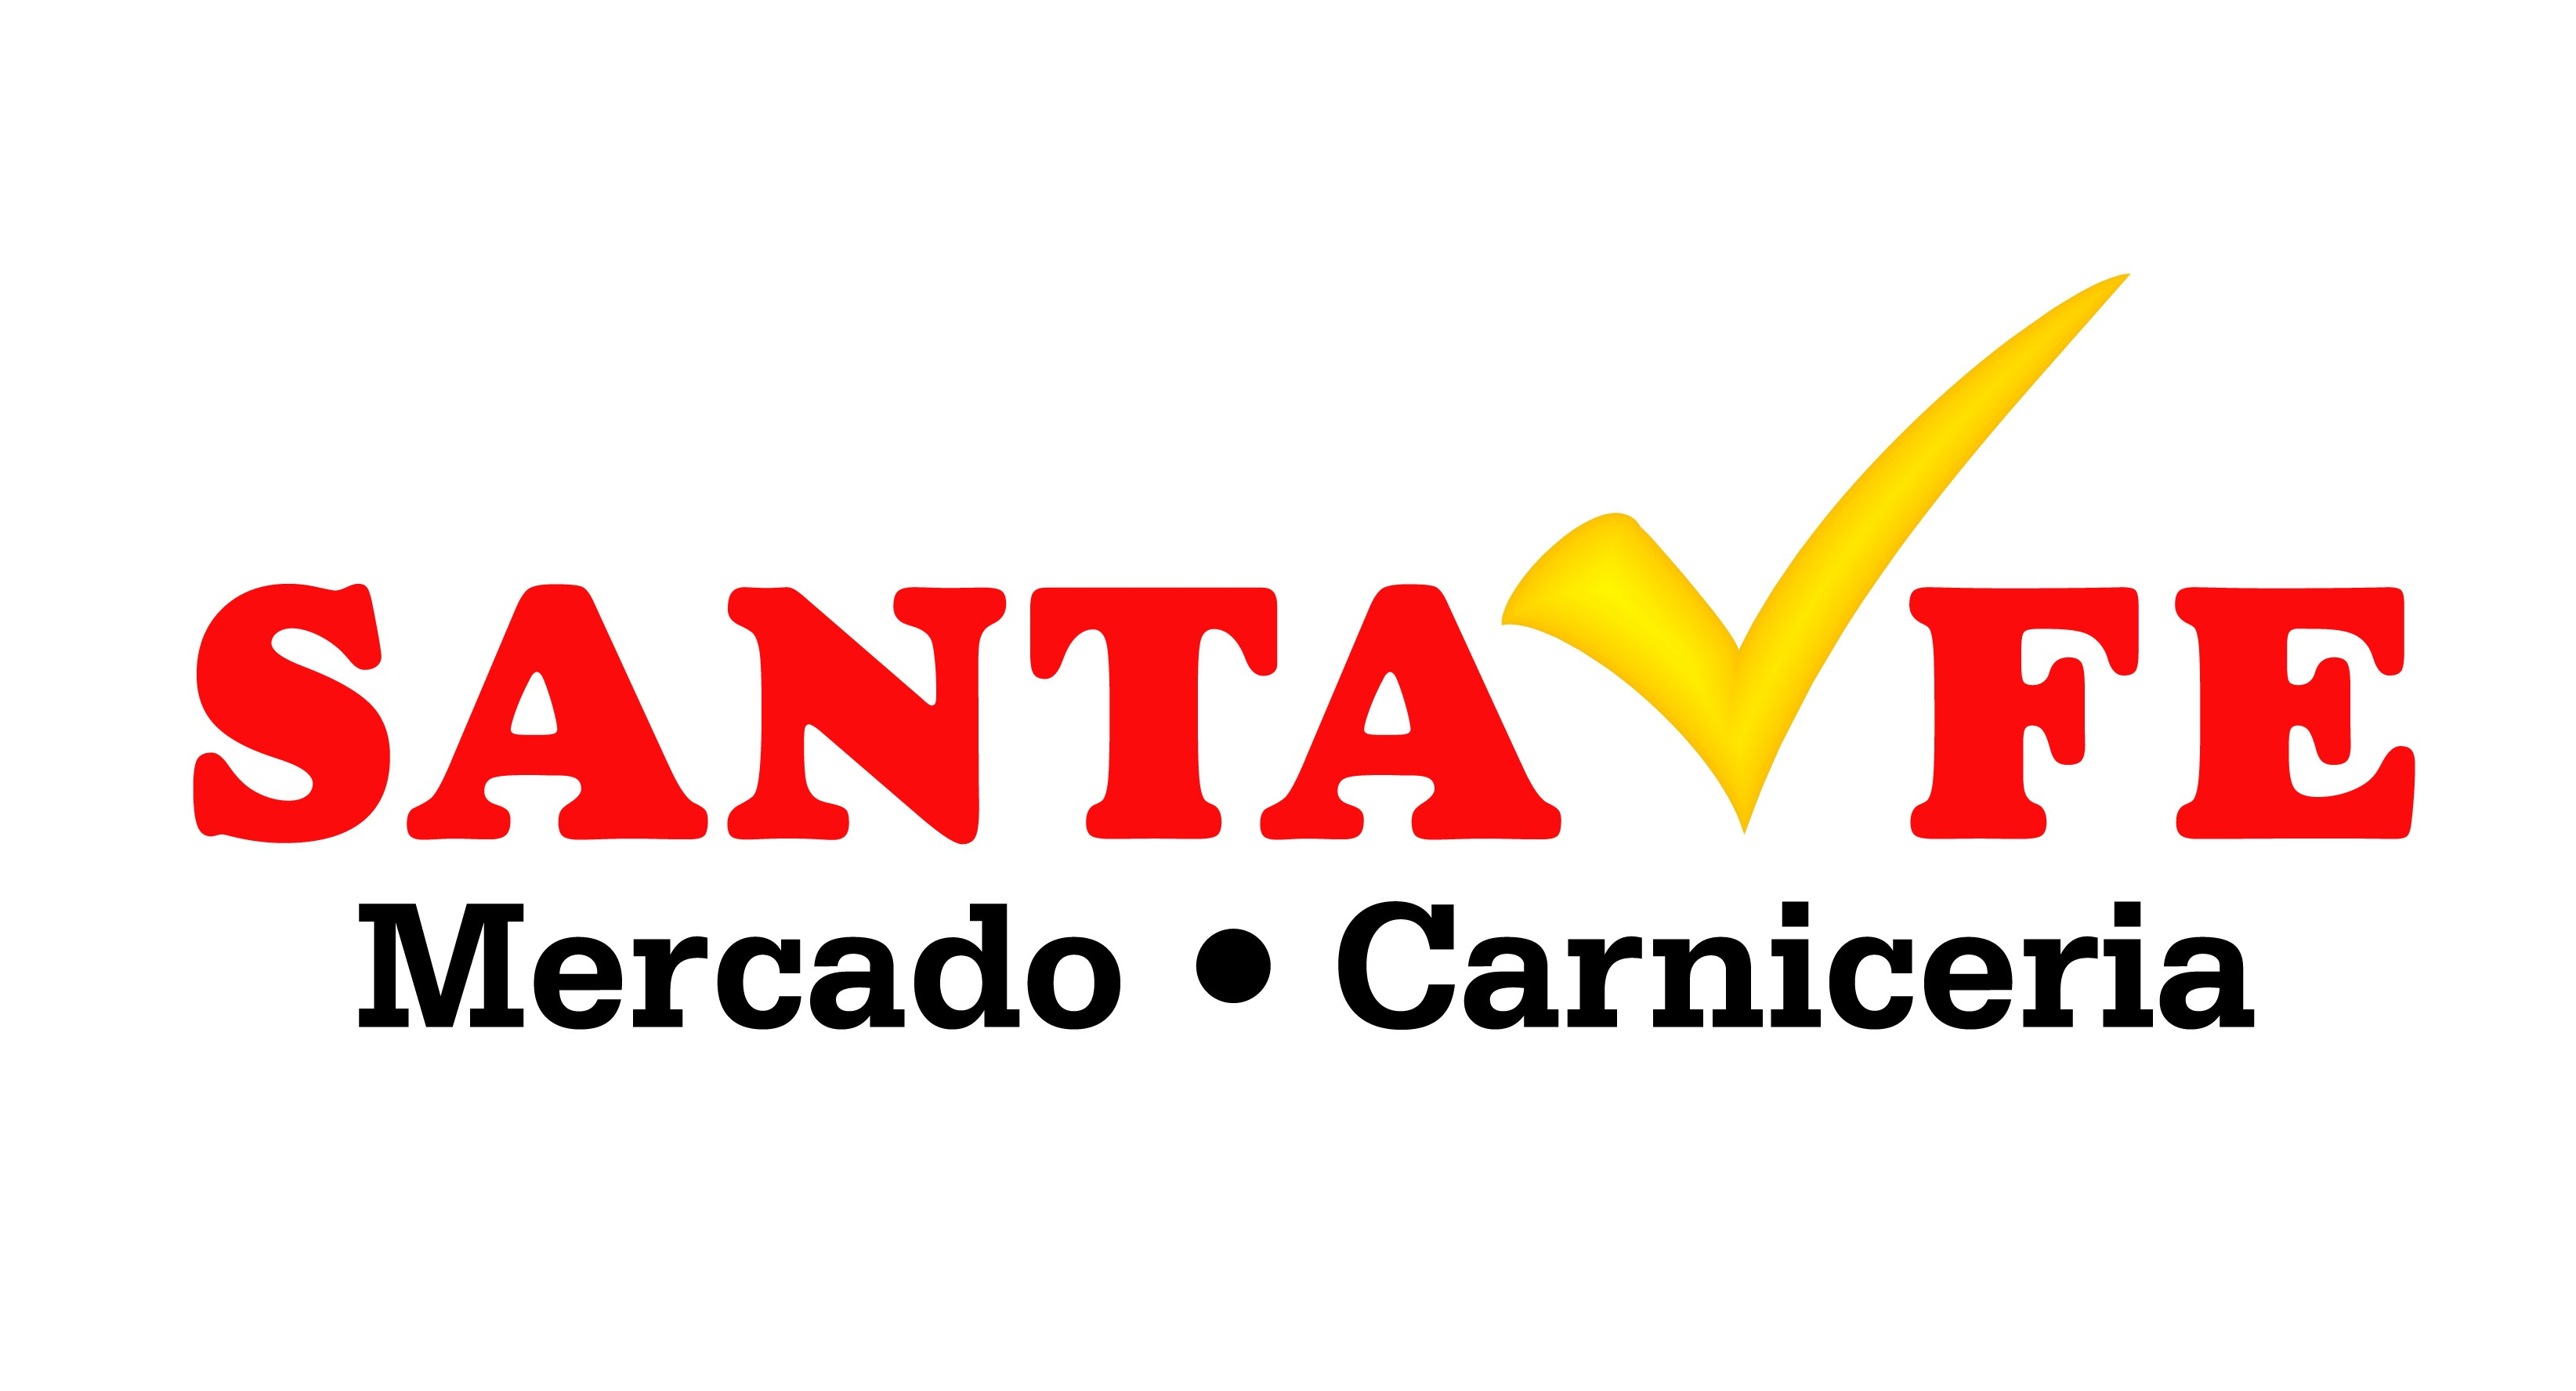 Santa Fe Mercado